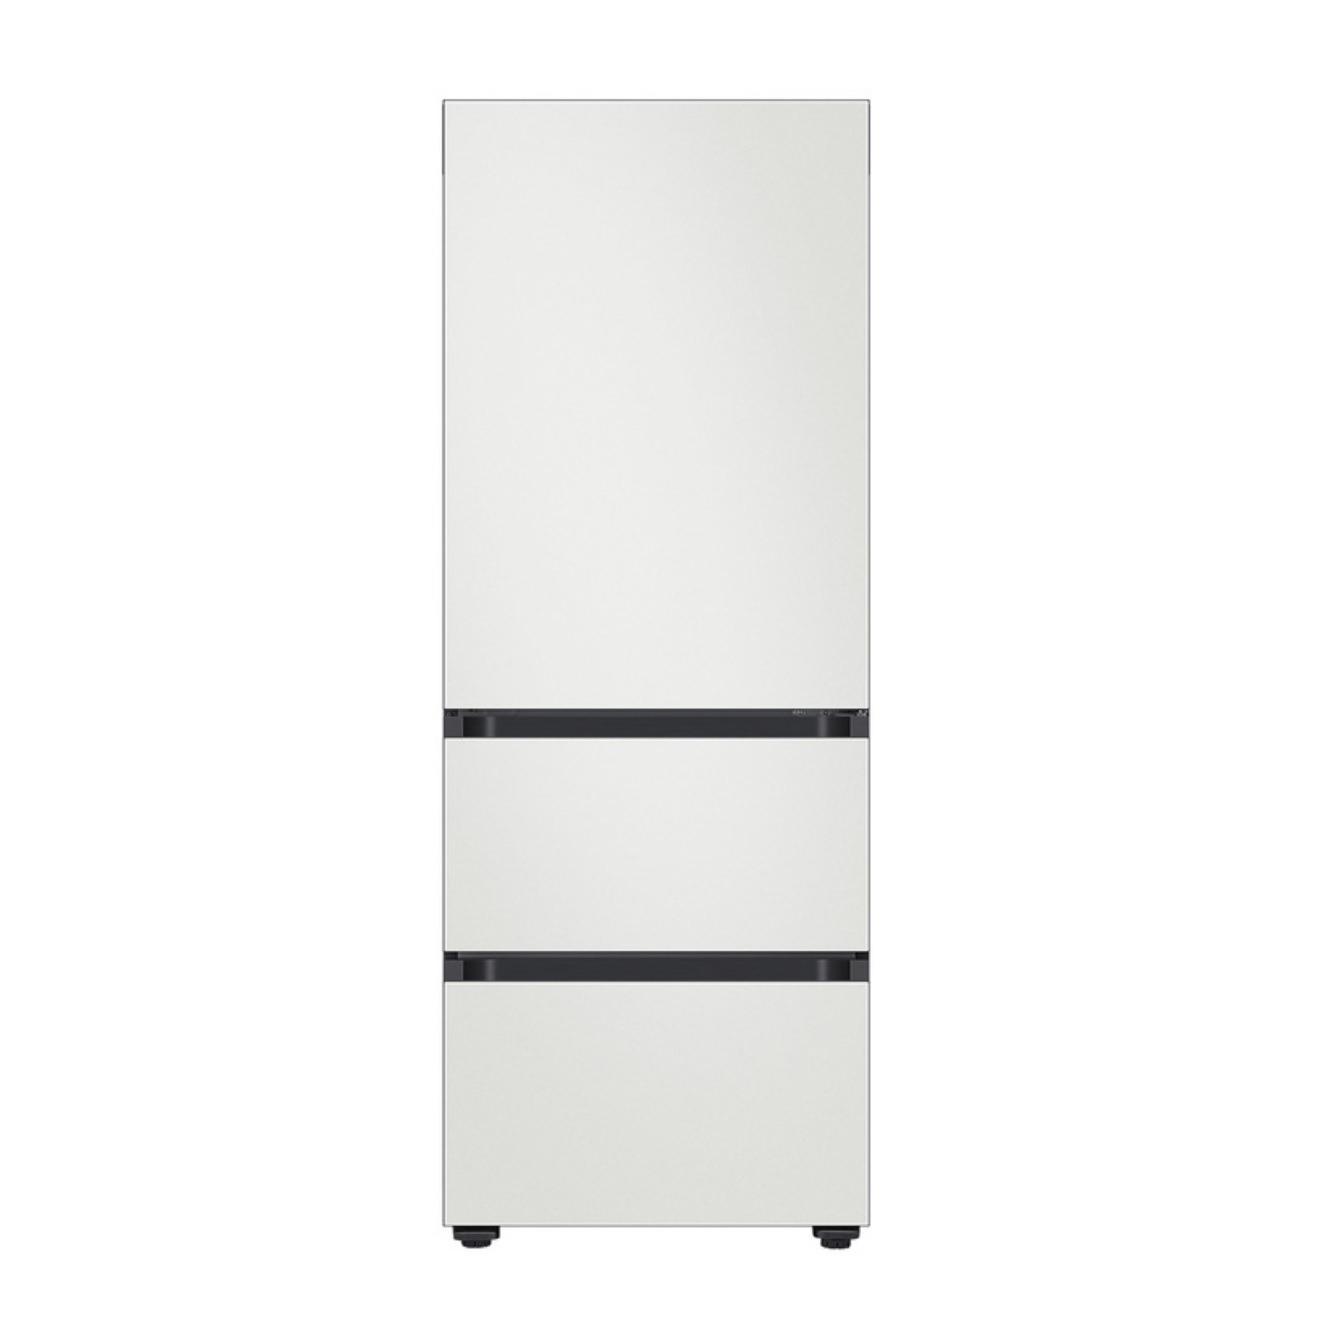 Samsung BESPOKE Kimchi Refrigerator 313L 삼성 비스포크 김치냉장고 코타화이트 RQ33R741201 스탠드형